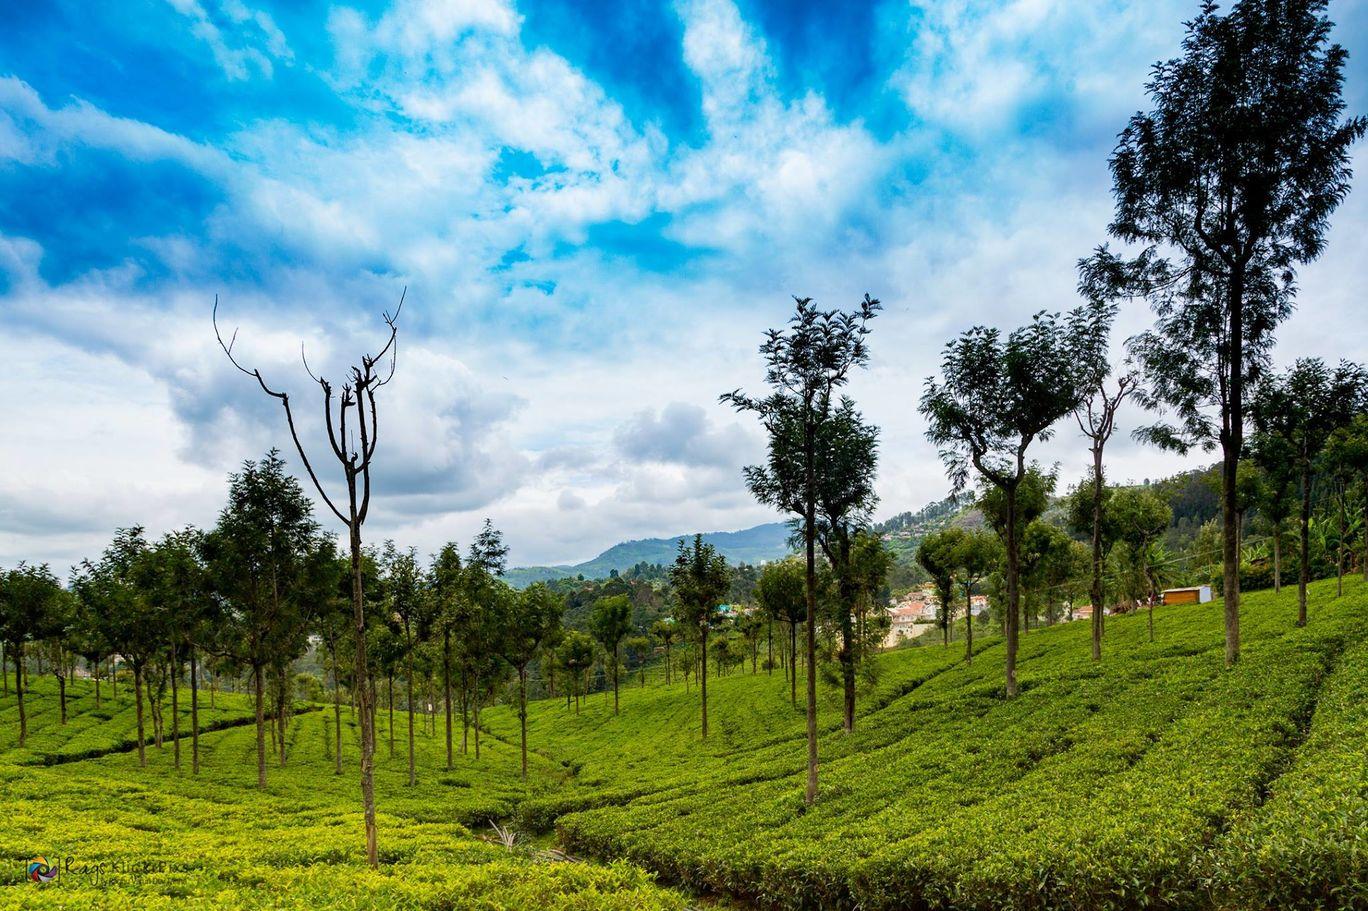 Photo of Making Of Tea Powder By Raghu Varun Dev Tanna